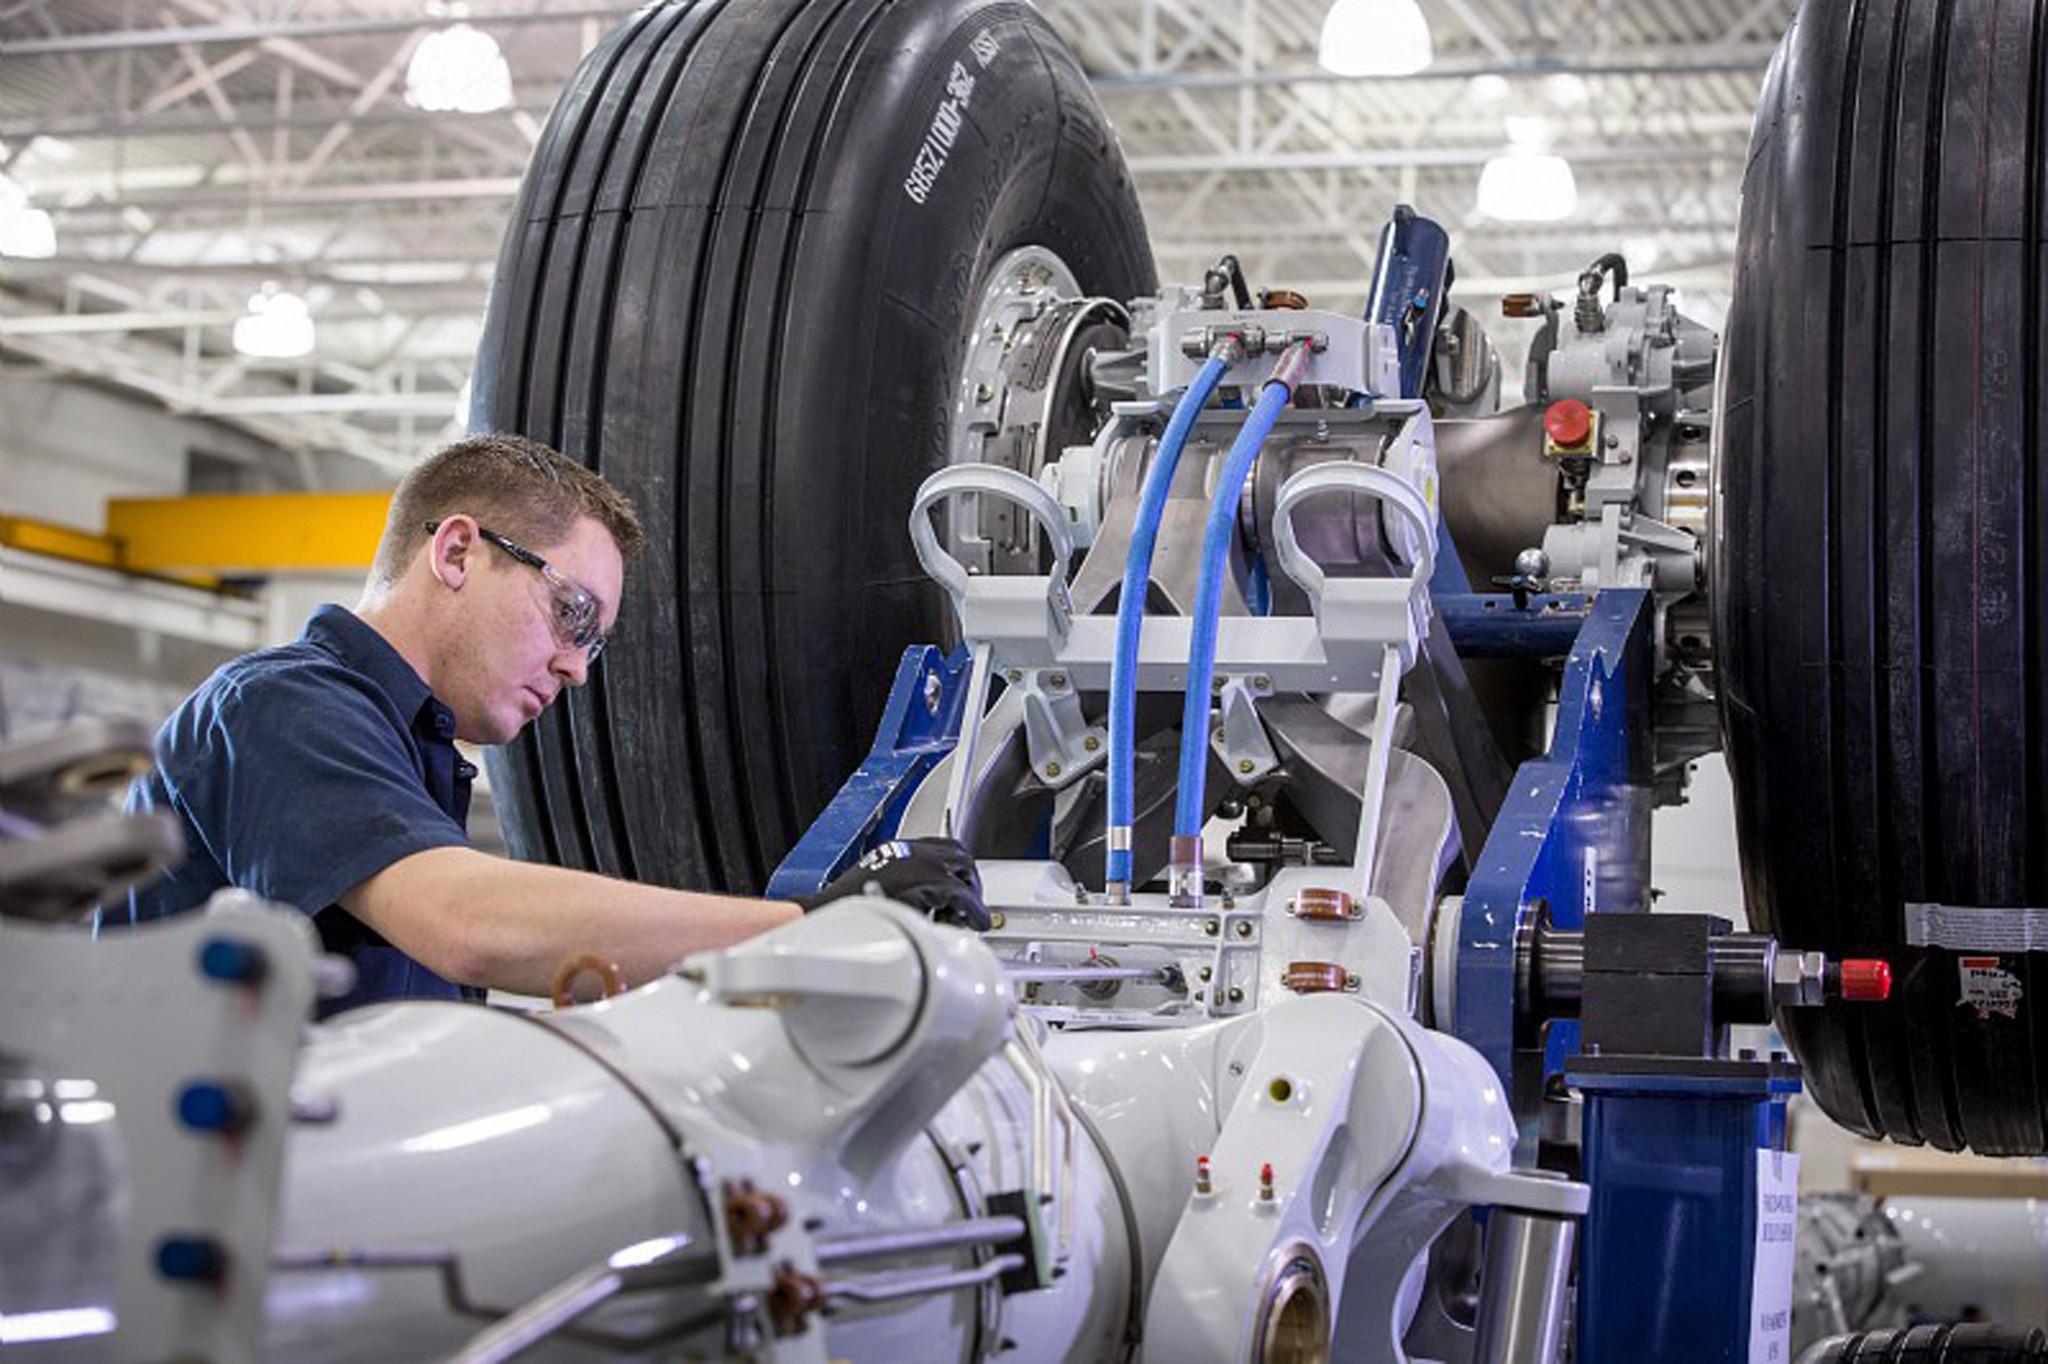 http://www.trbimg.com/img-5564c222/turbine/mc-safran-opens-lehigh-valley-facility-20150526